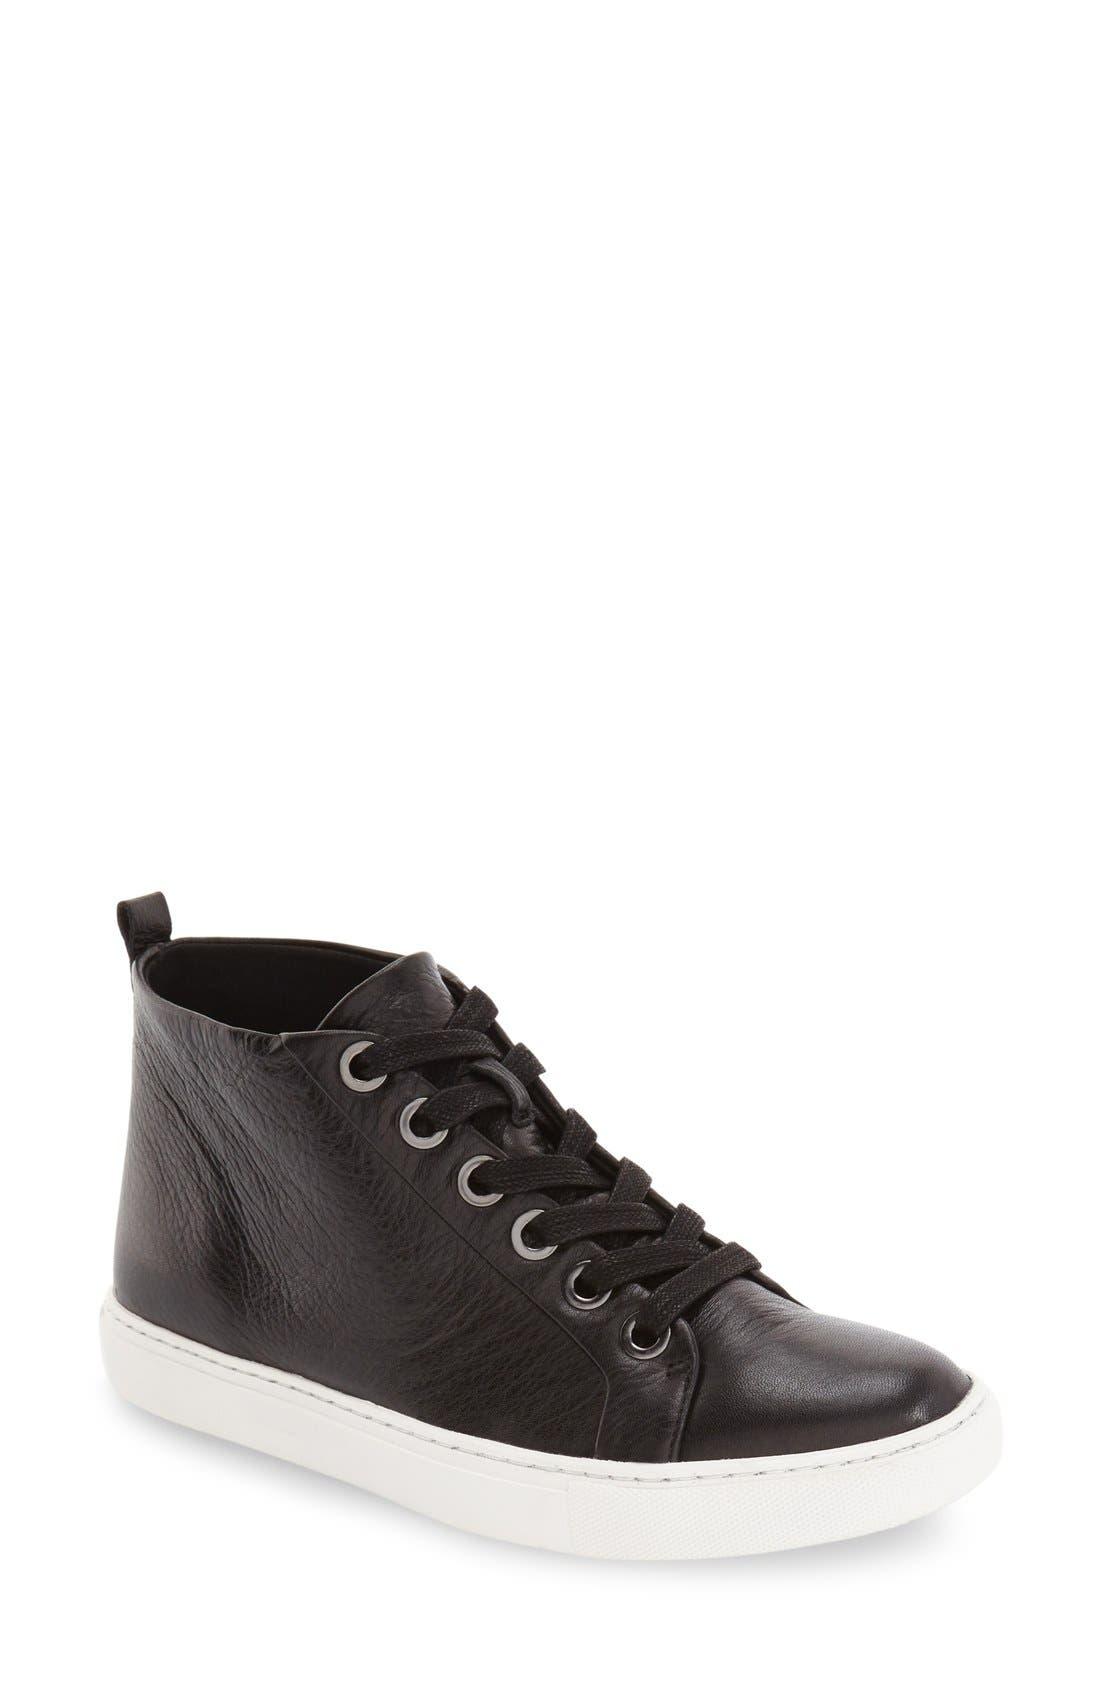 Alternate Image 1 Selected - Kenneth Cole New York 'Kaleb' High Top Sneaker (Women)